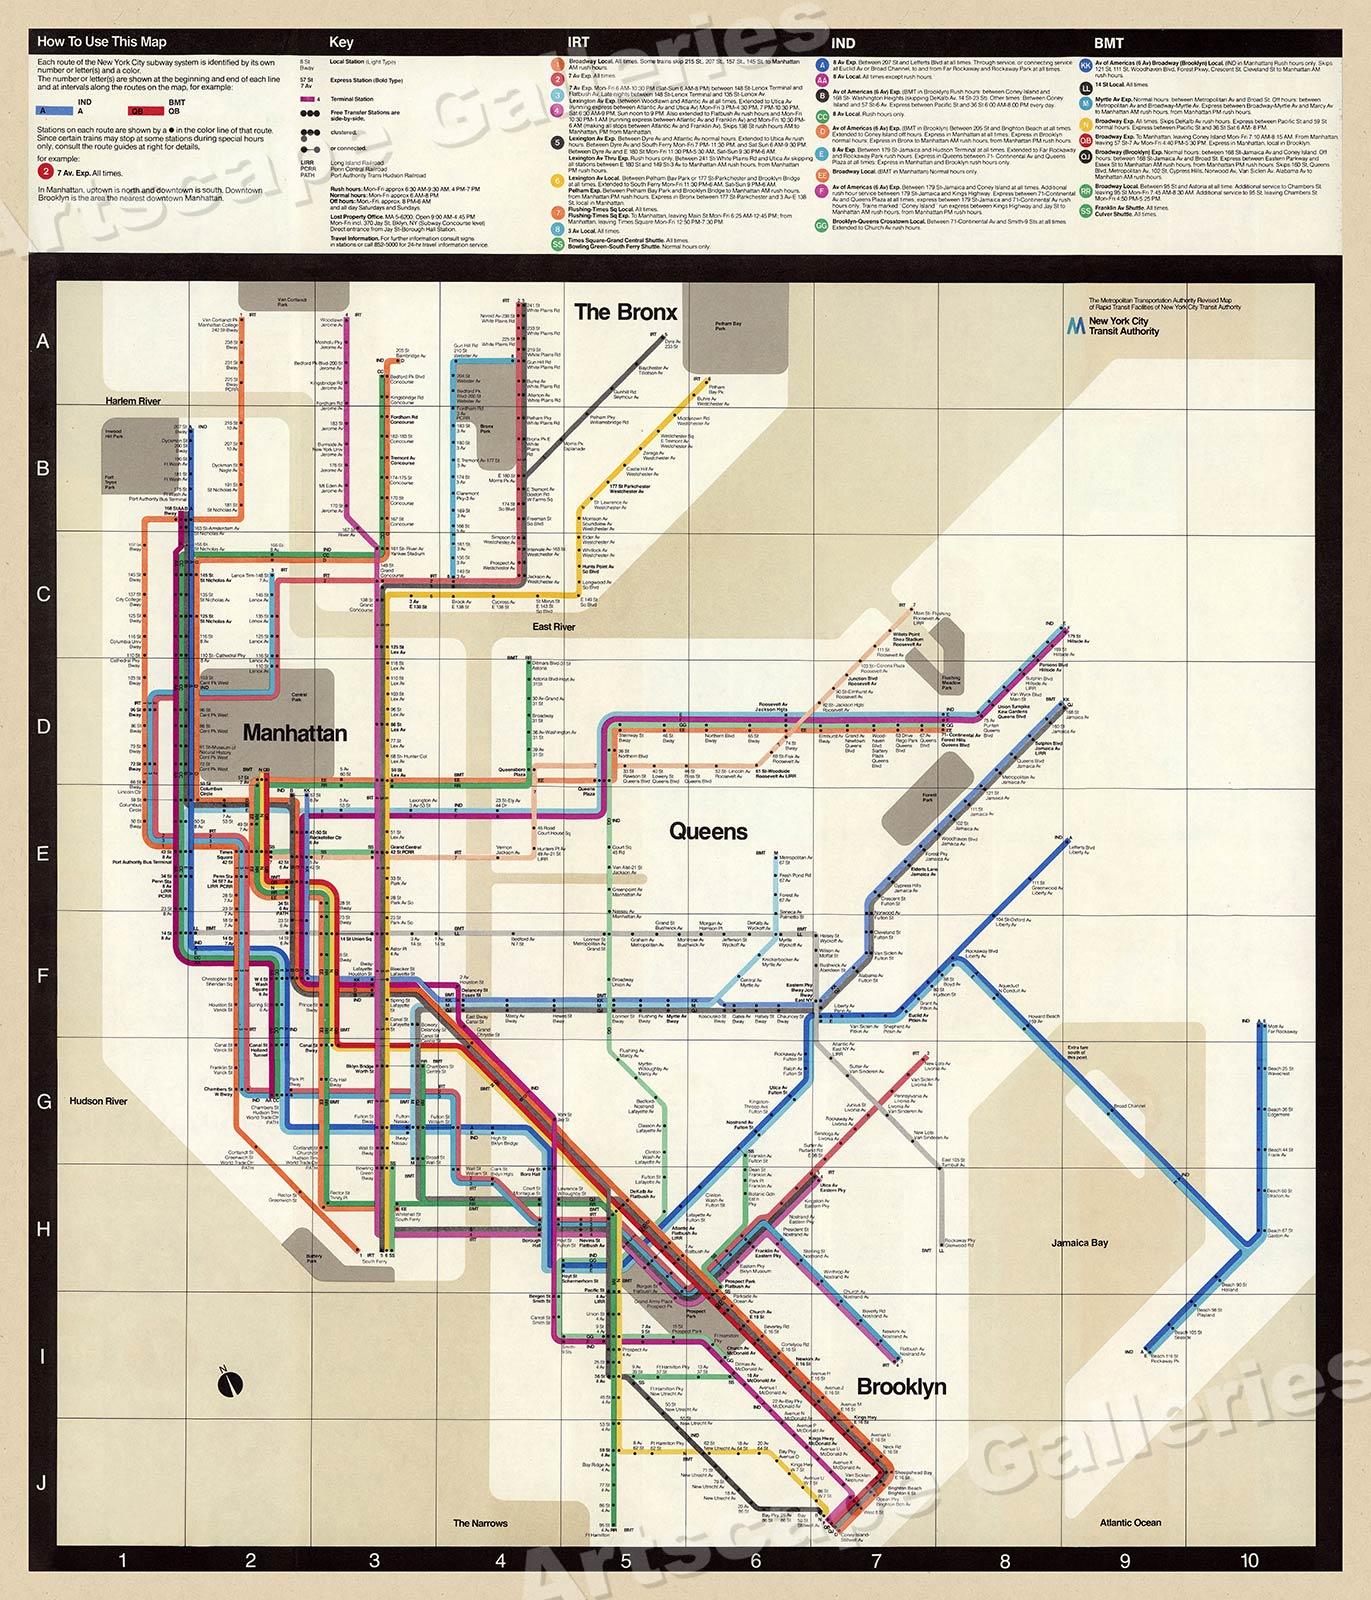 New York Subway Map Vignelli.1972 Massimo Vignelli New York Subway Map 24x28 Ebay